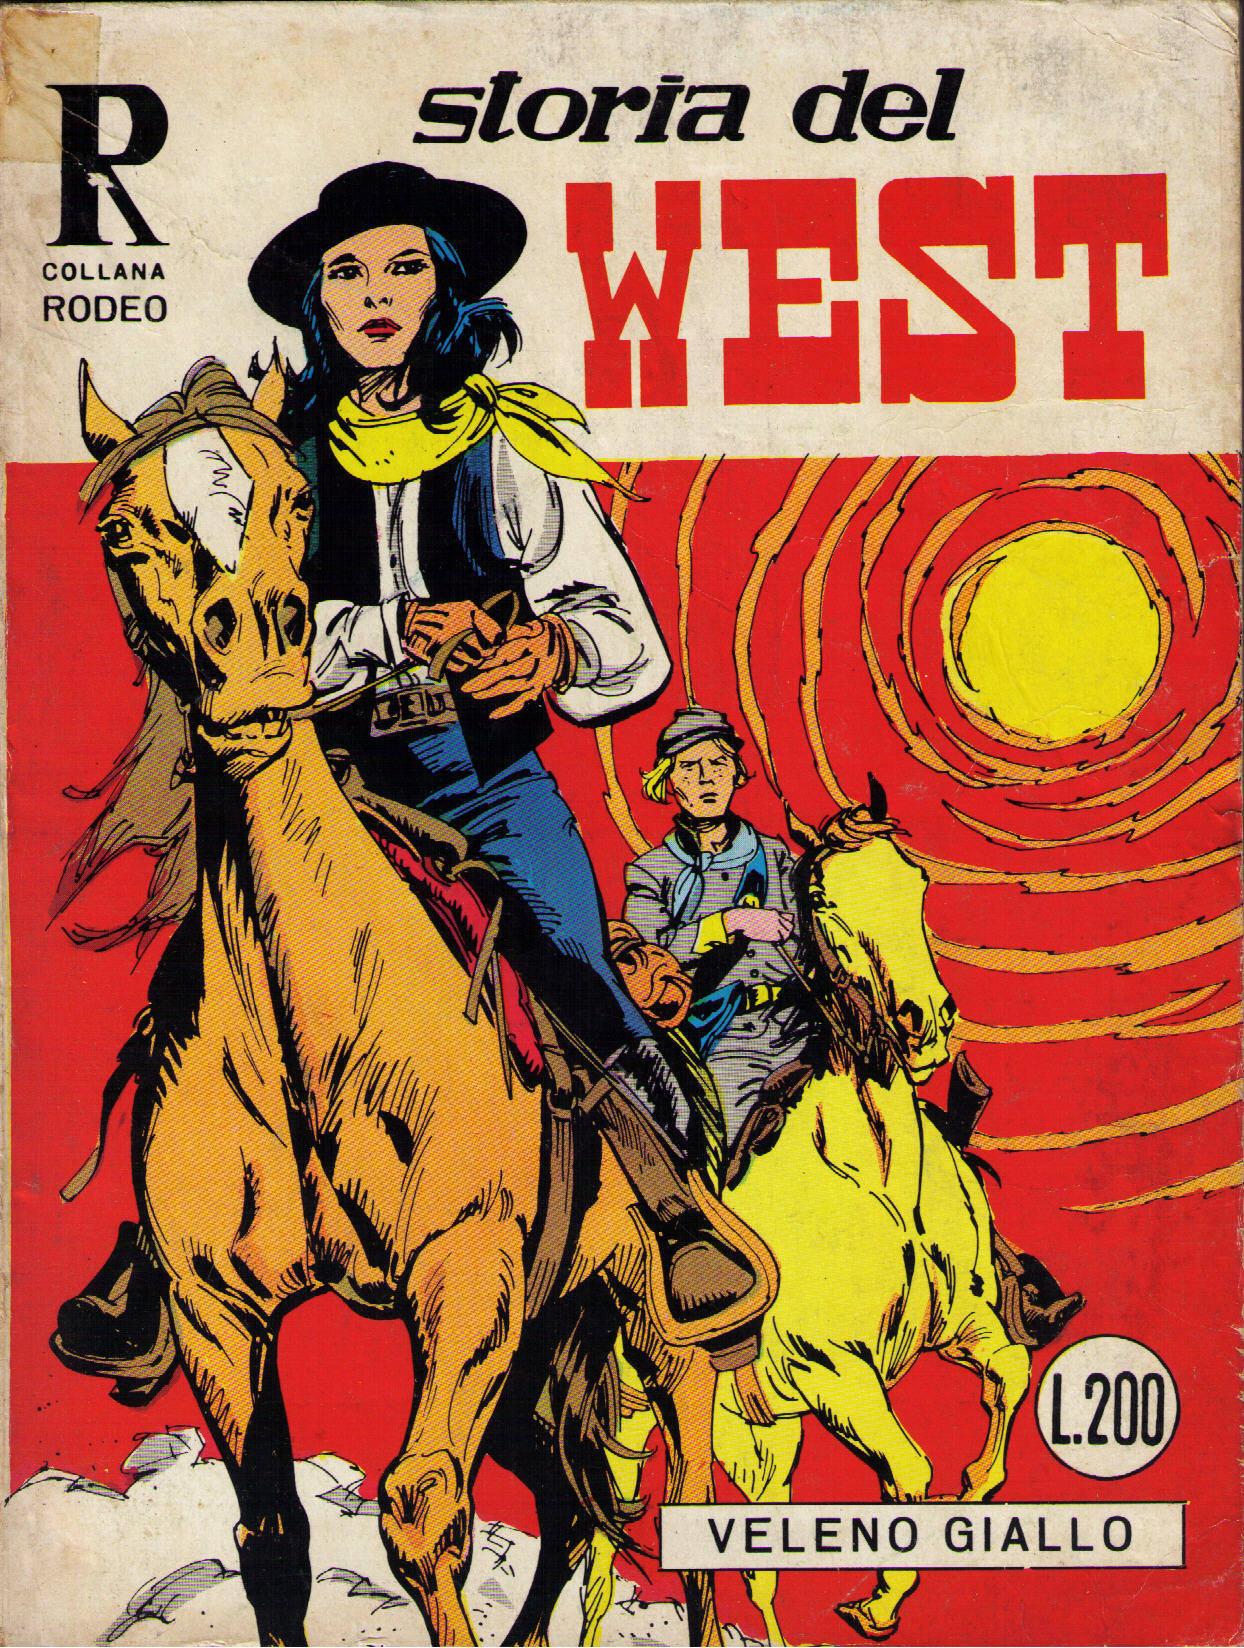 Storia del west n.26 (Collana Rodeo n.56)